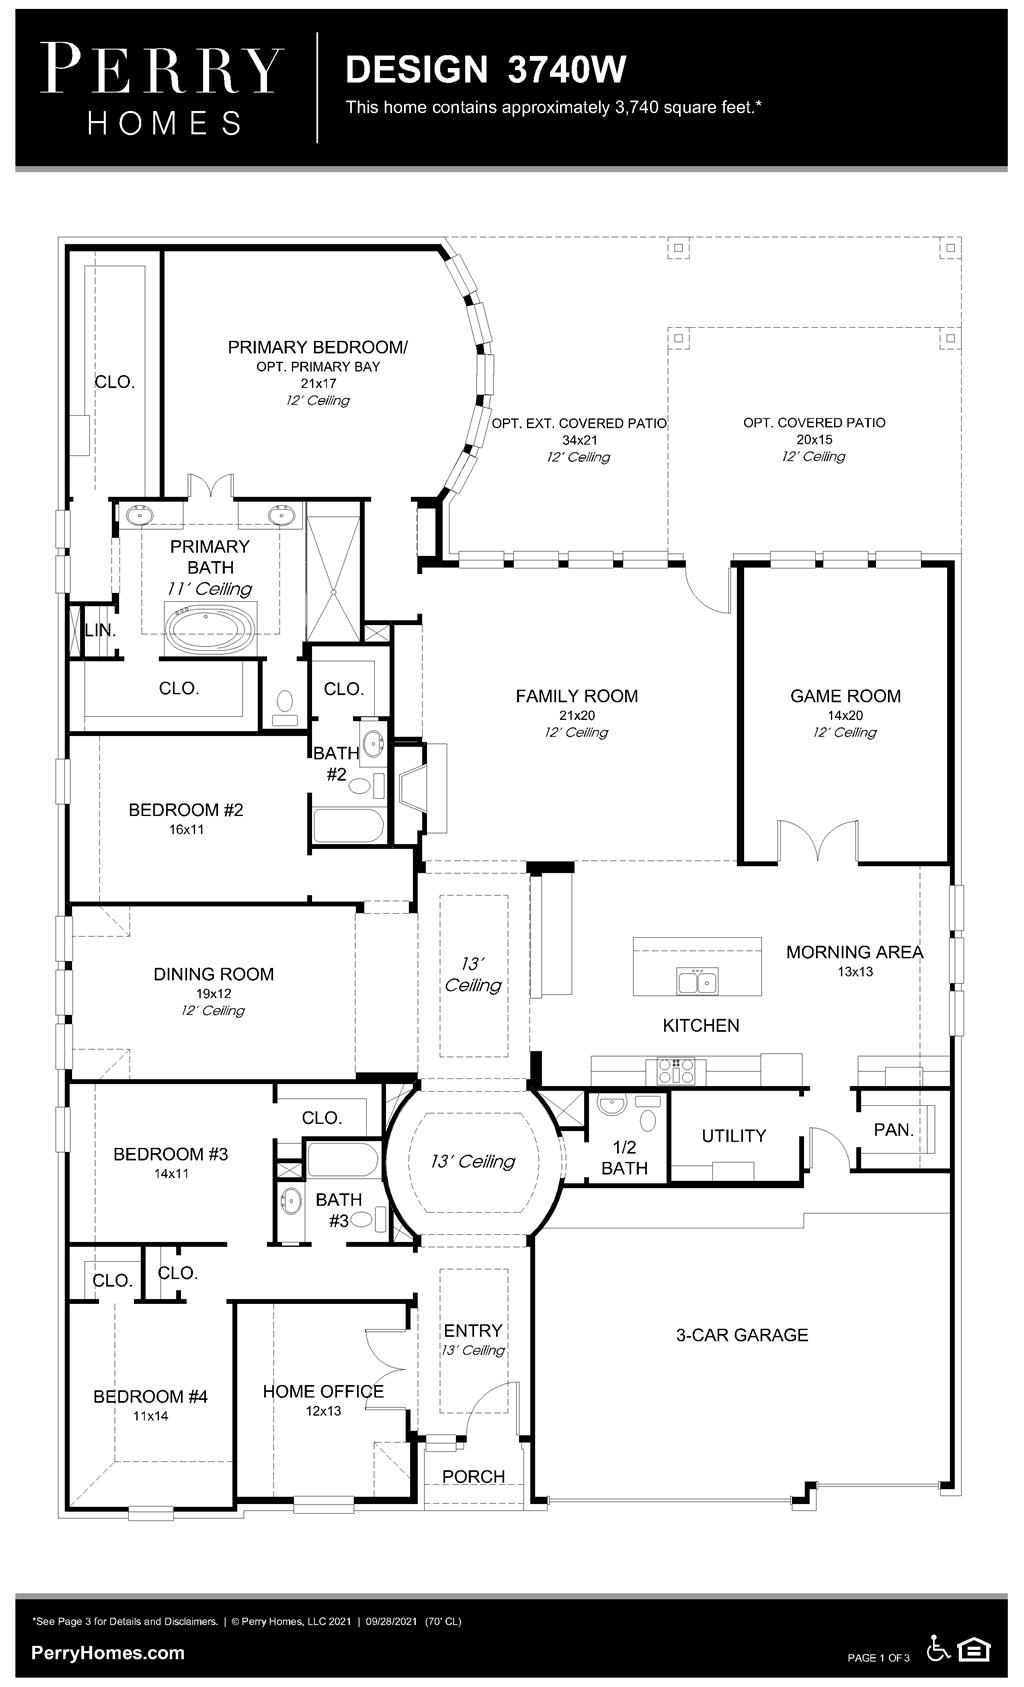 Floor Plan for 3740W